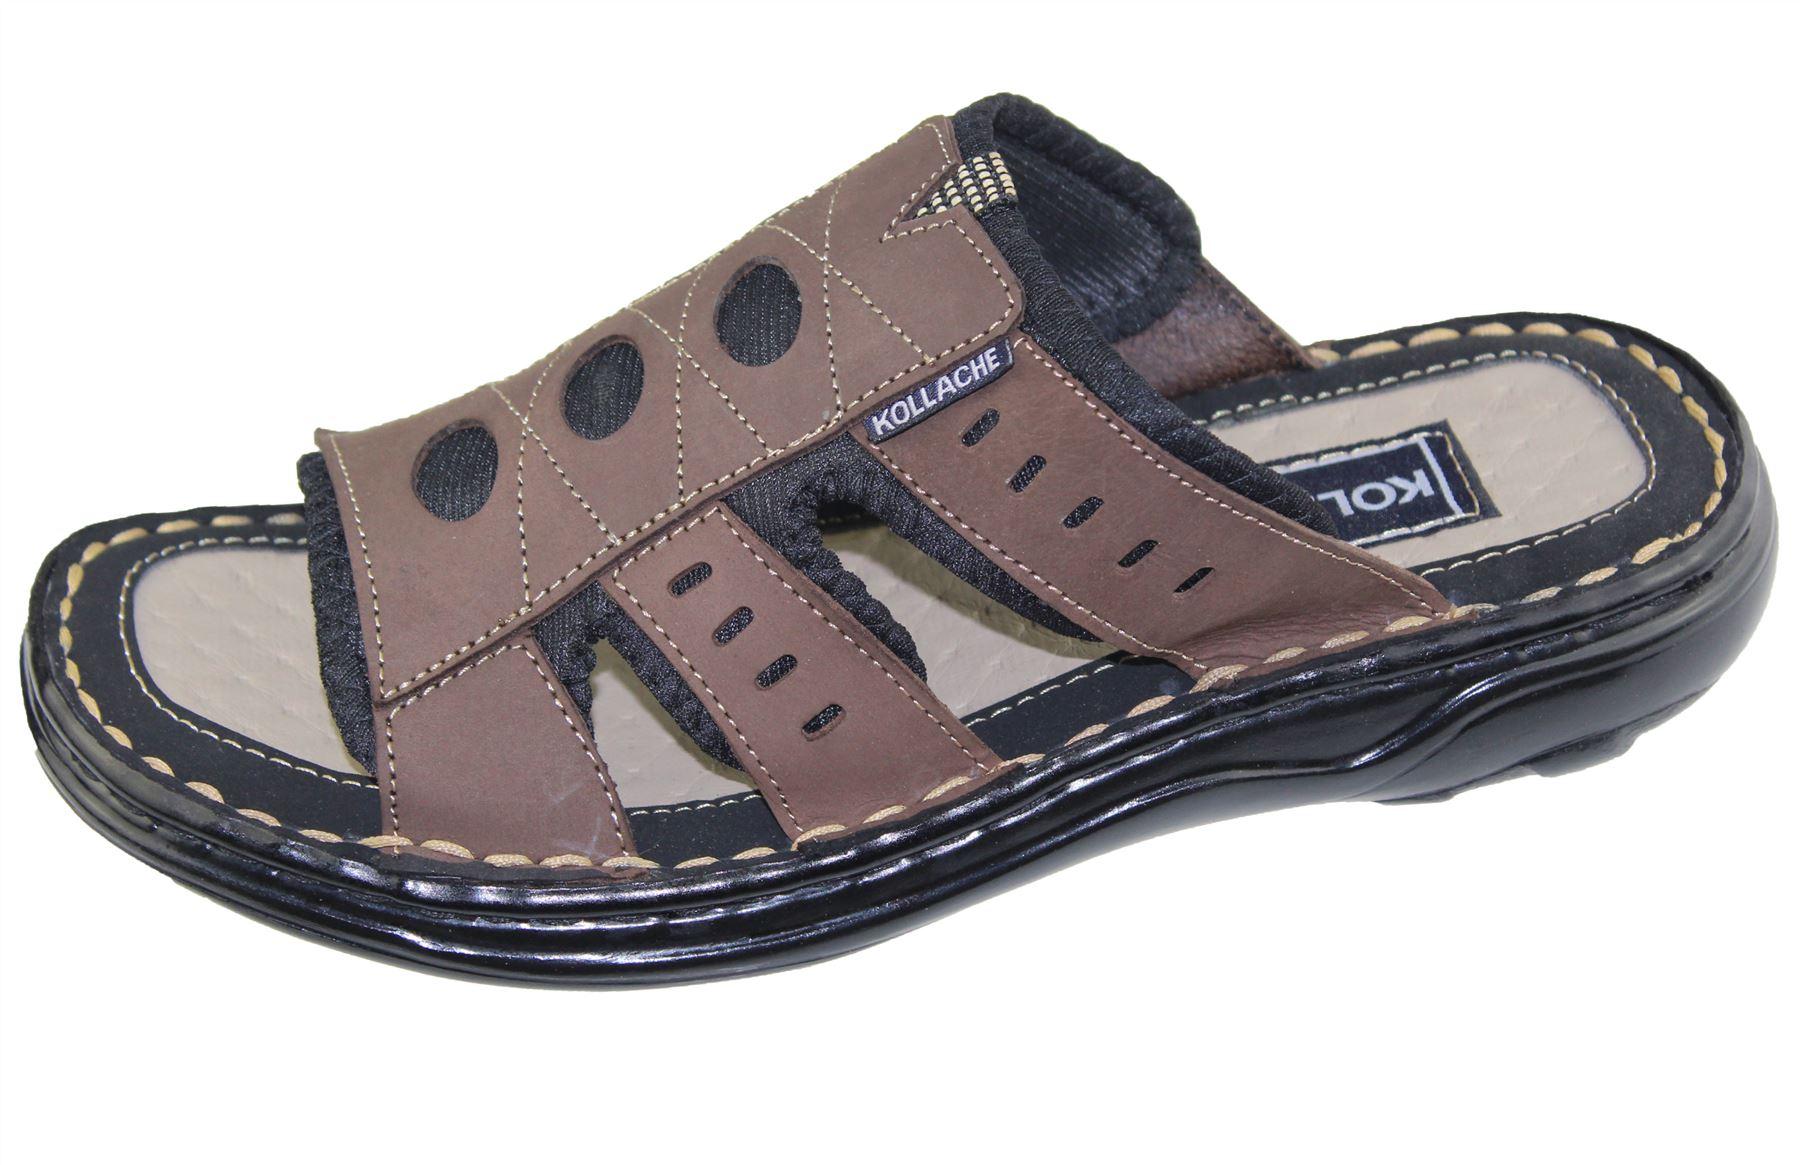 Mens-Slipper-Sandal-Sports-Beach-Buckle-Walking-Fashion-Summer-Casual-Shoes-Size miniatura 21